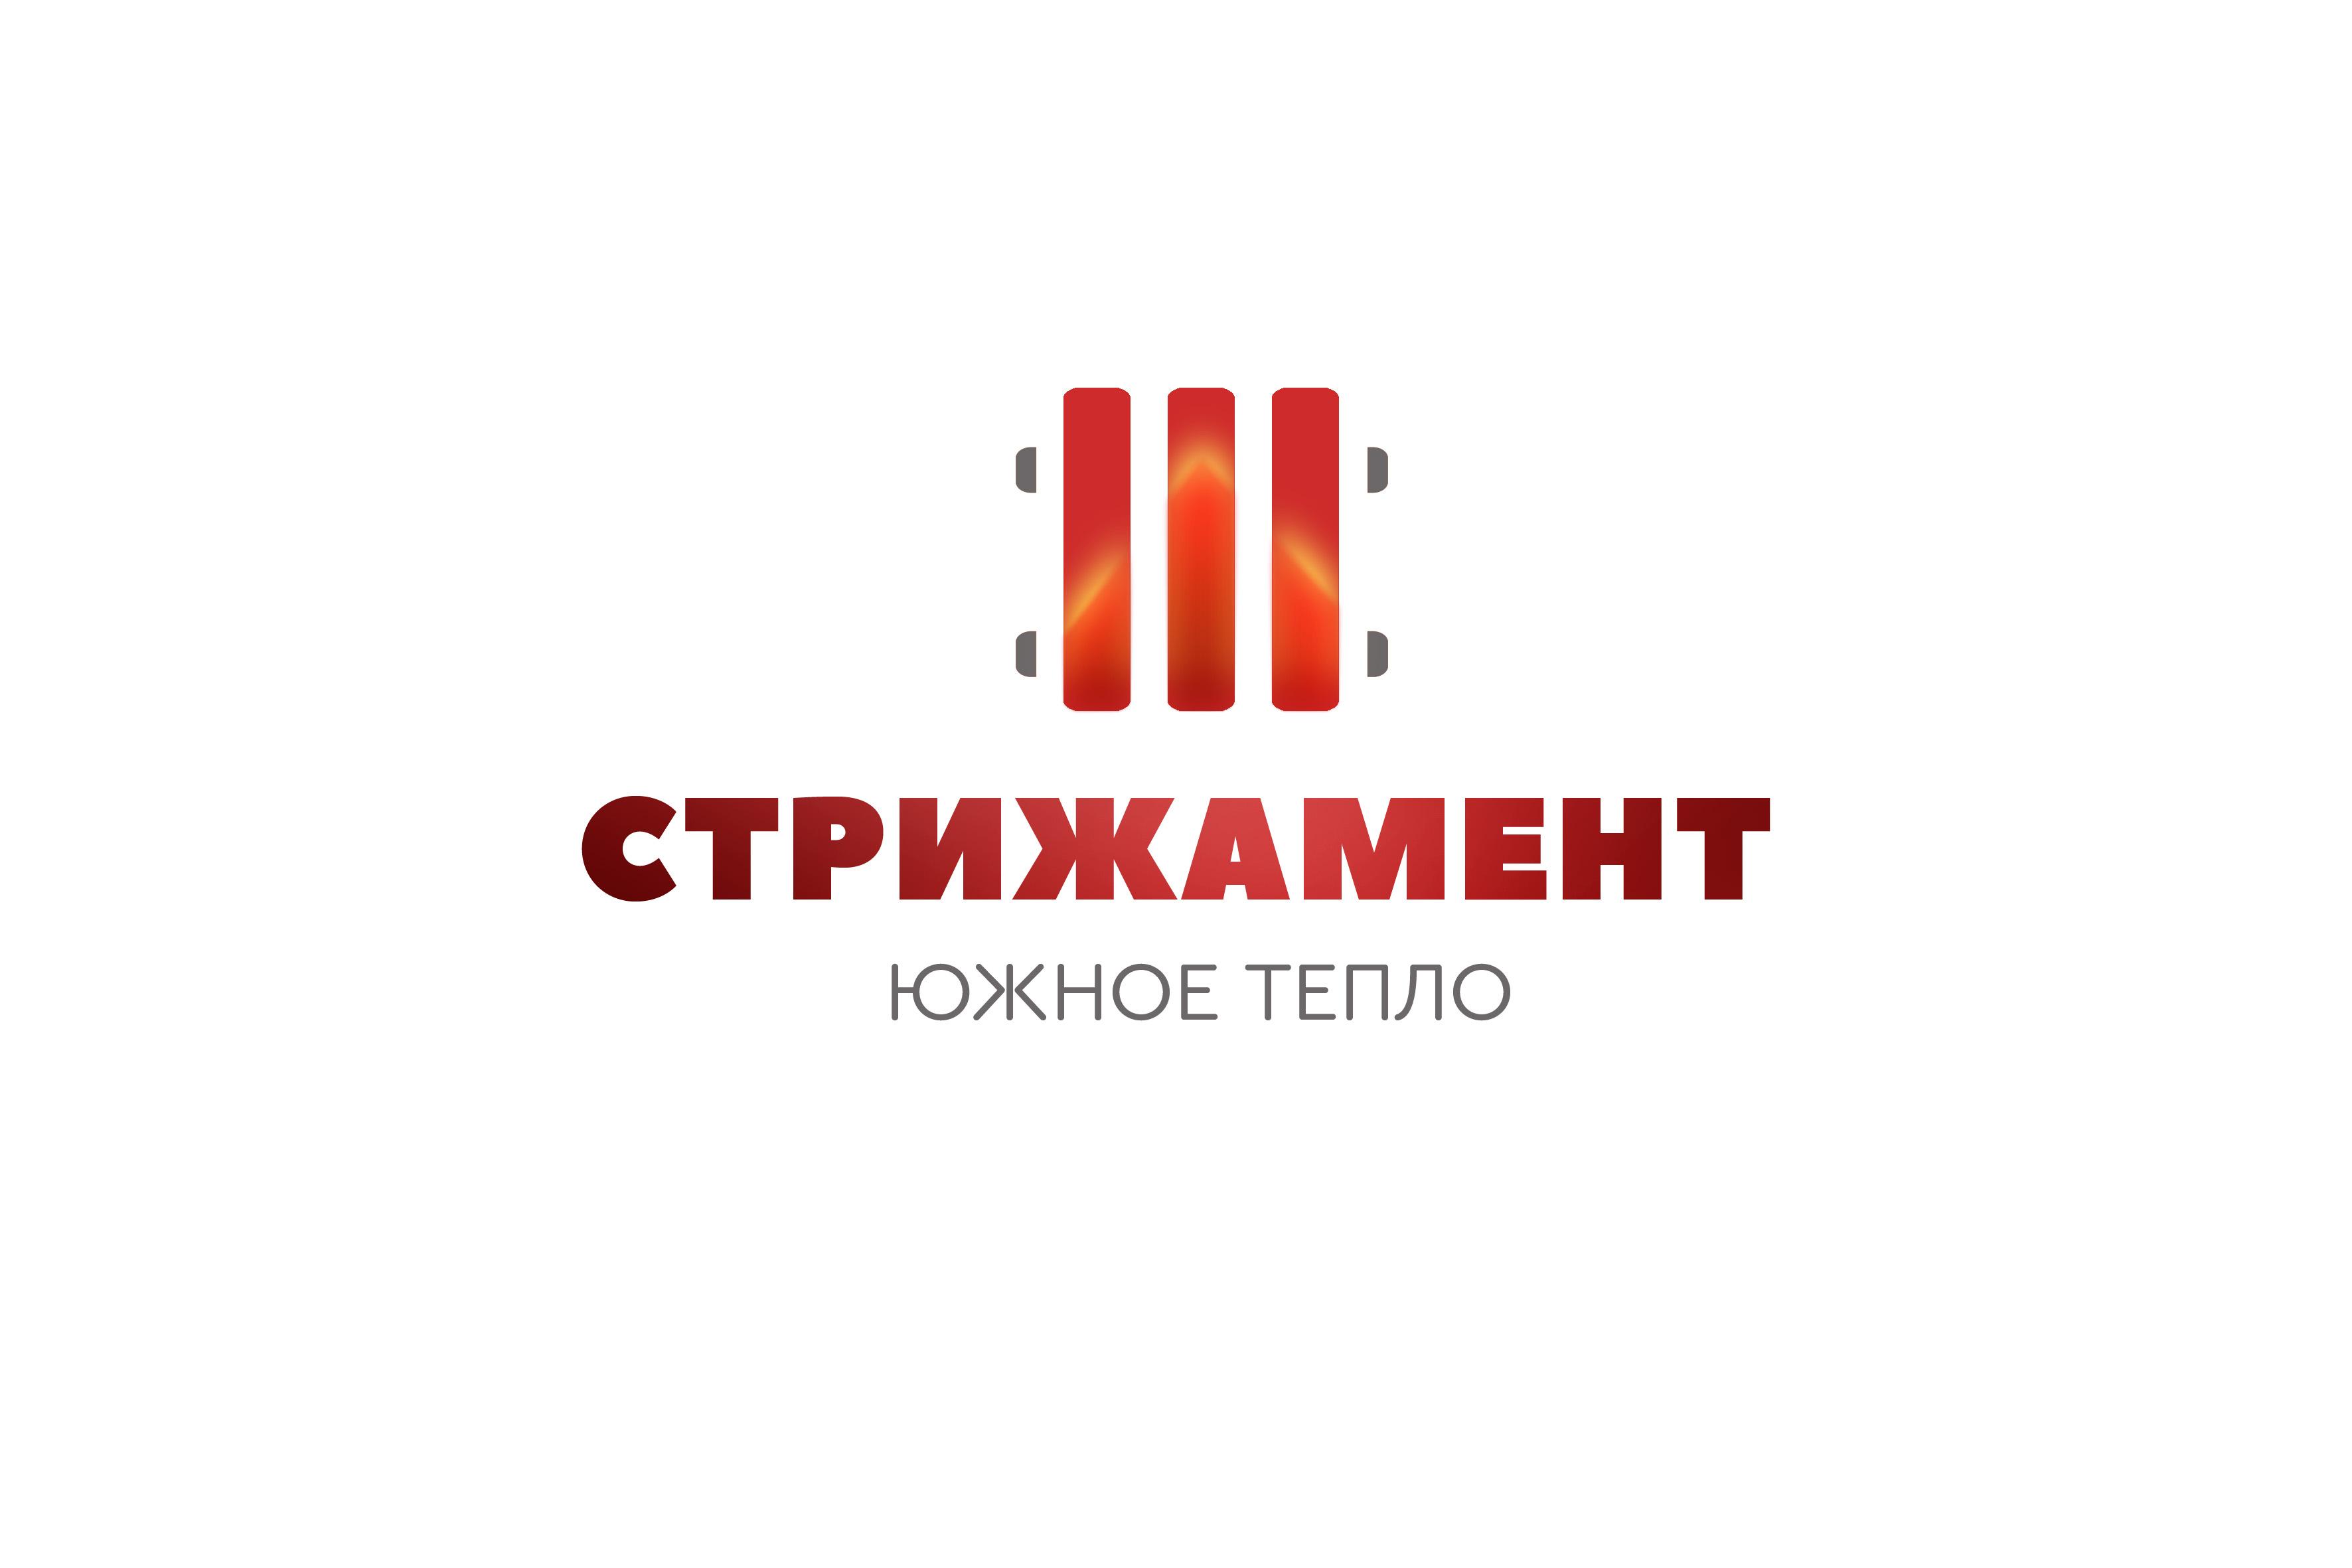 Дизайн лого бренда фото f_3495d50b4409c638.jpg